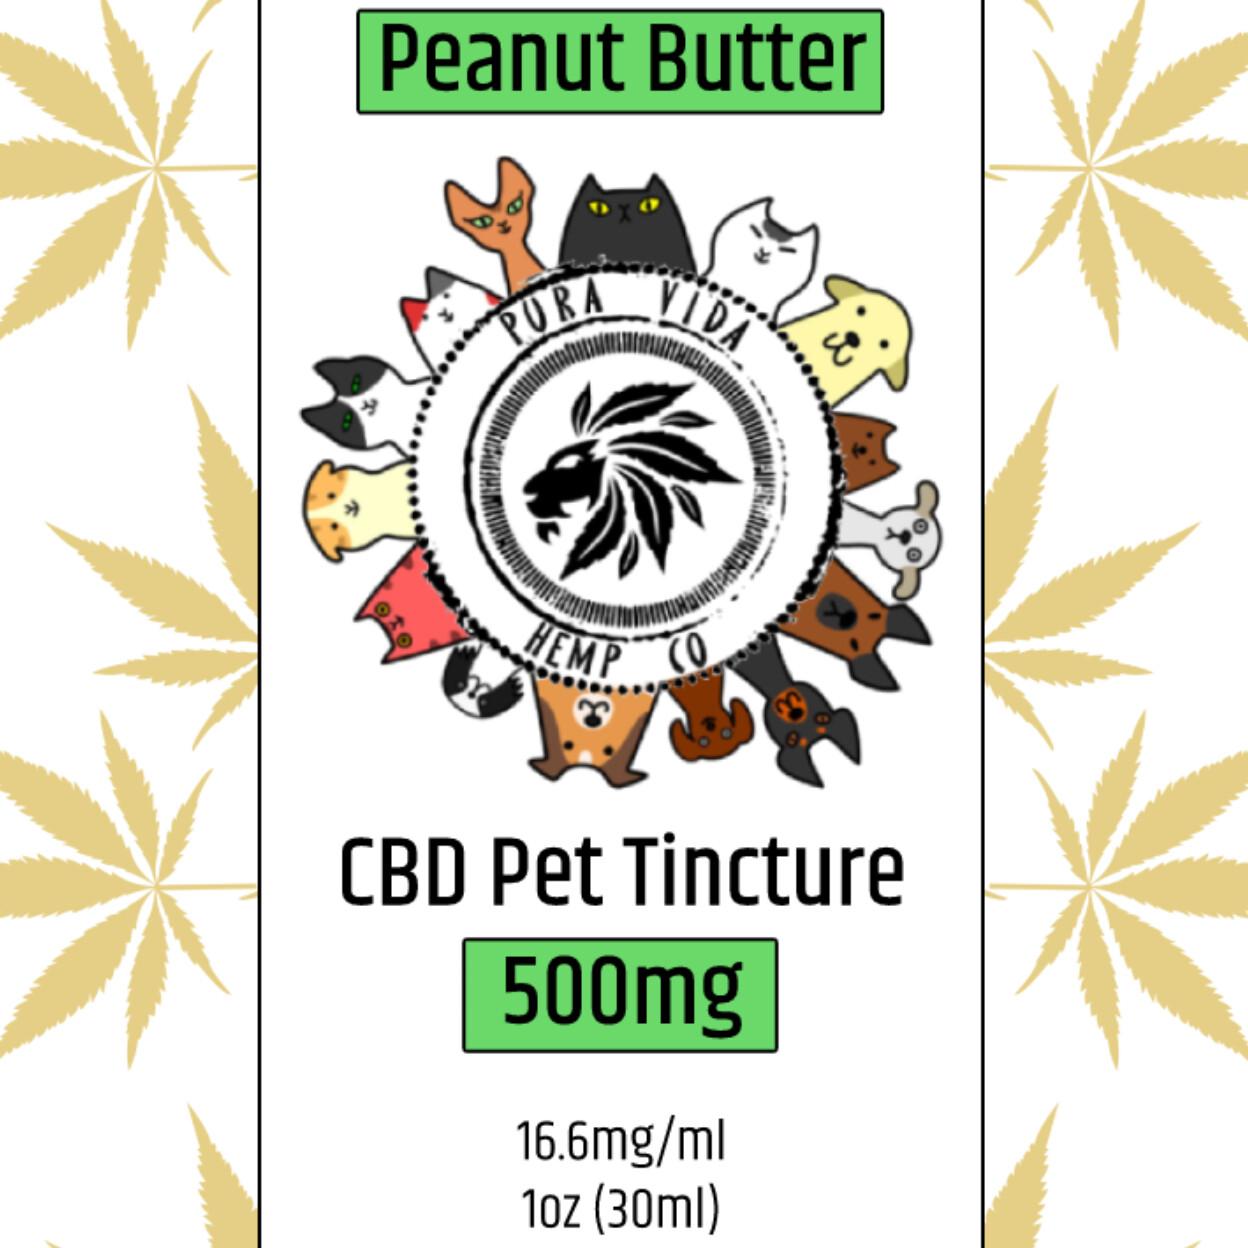 CBD Pet Tincture Peanut Butter - Lab Tested - THC Free